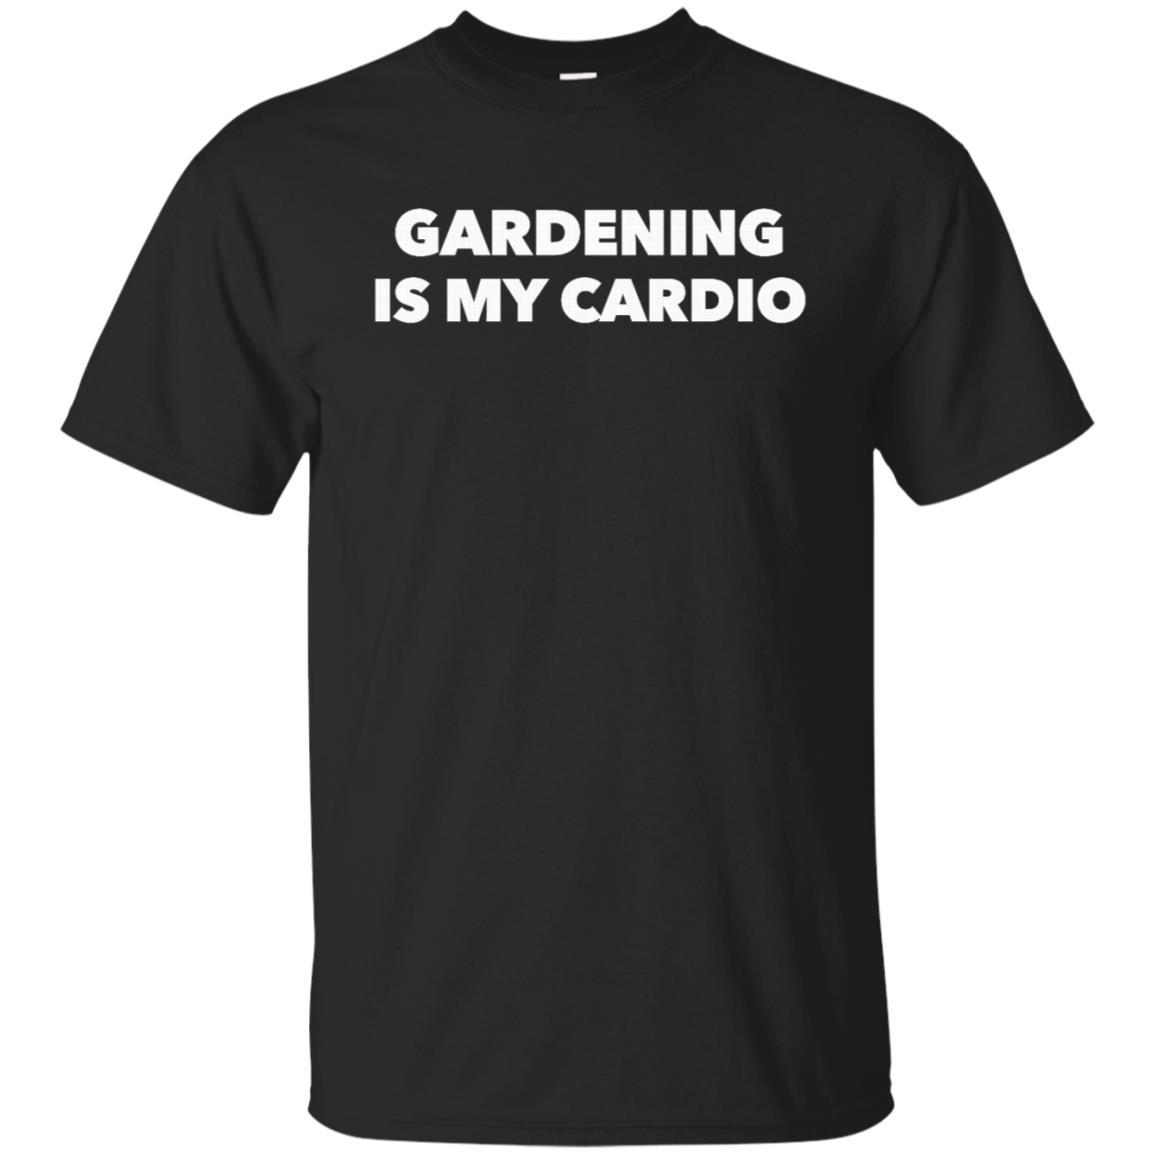 Gardening is my cardio Unisex Short Sleeve